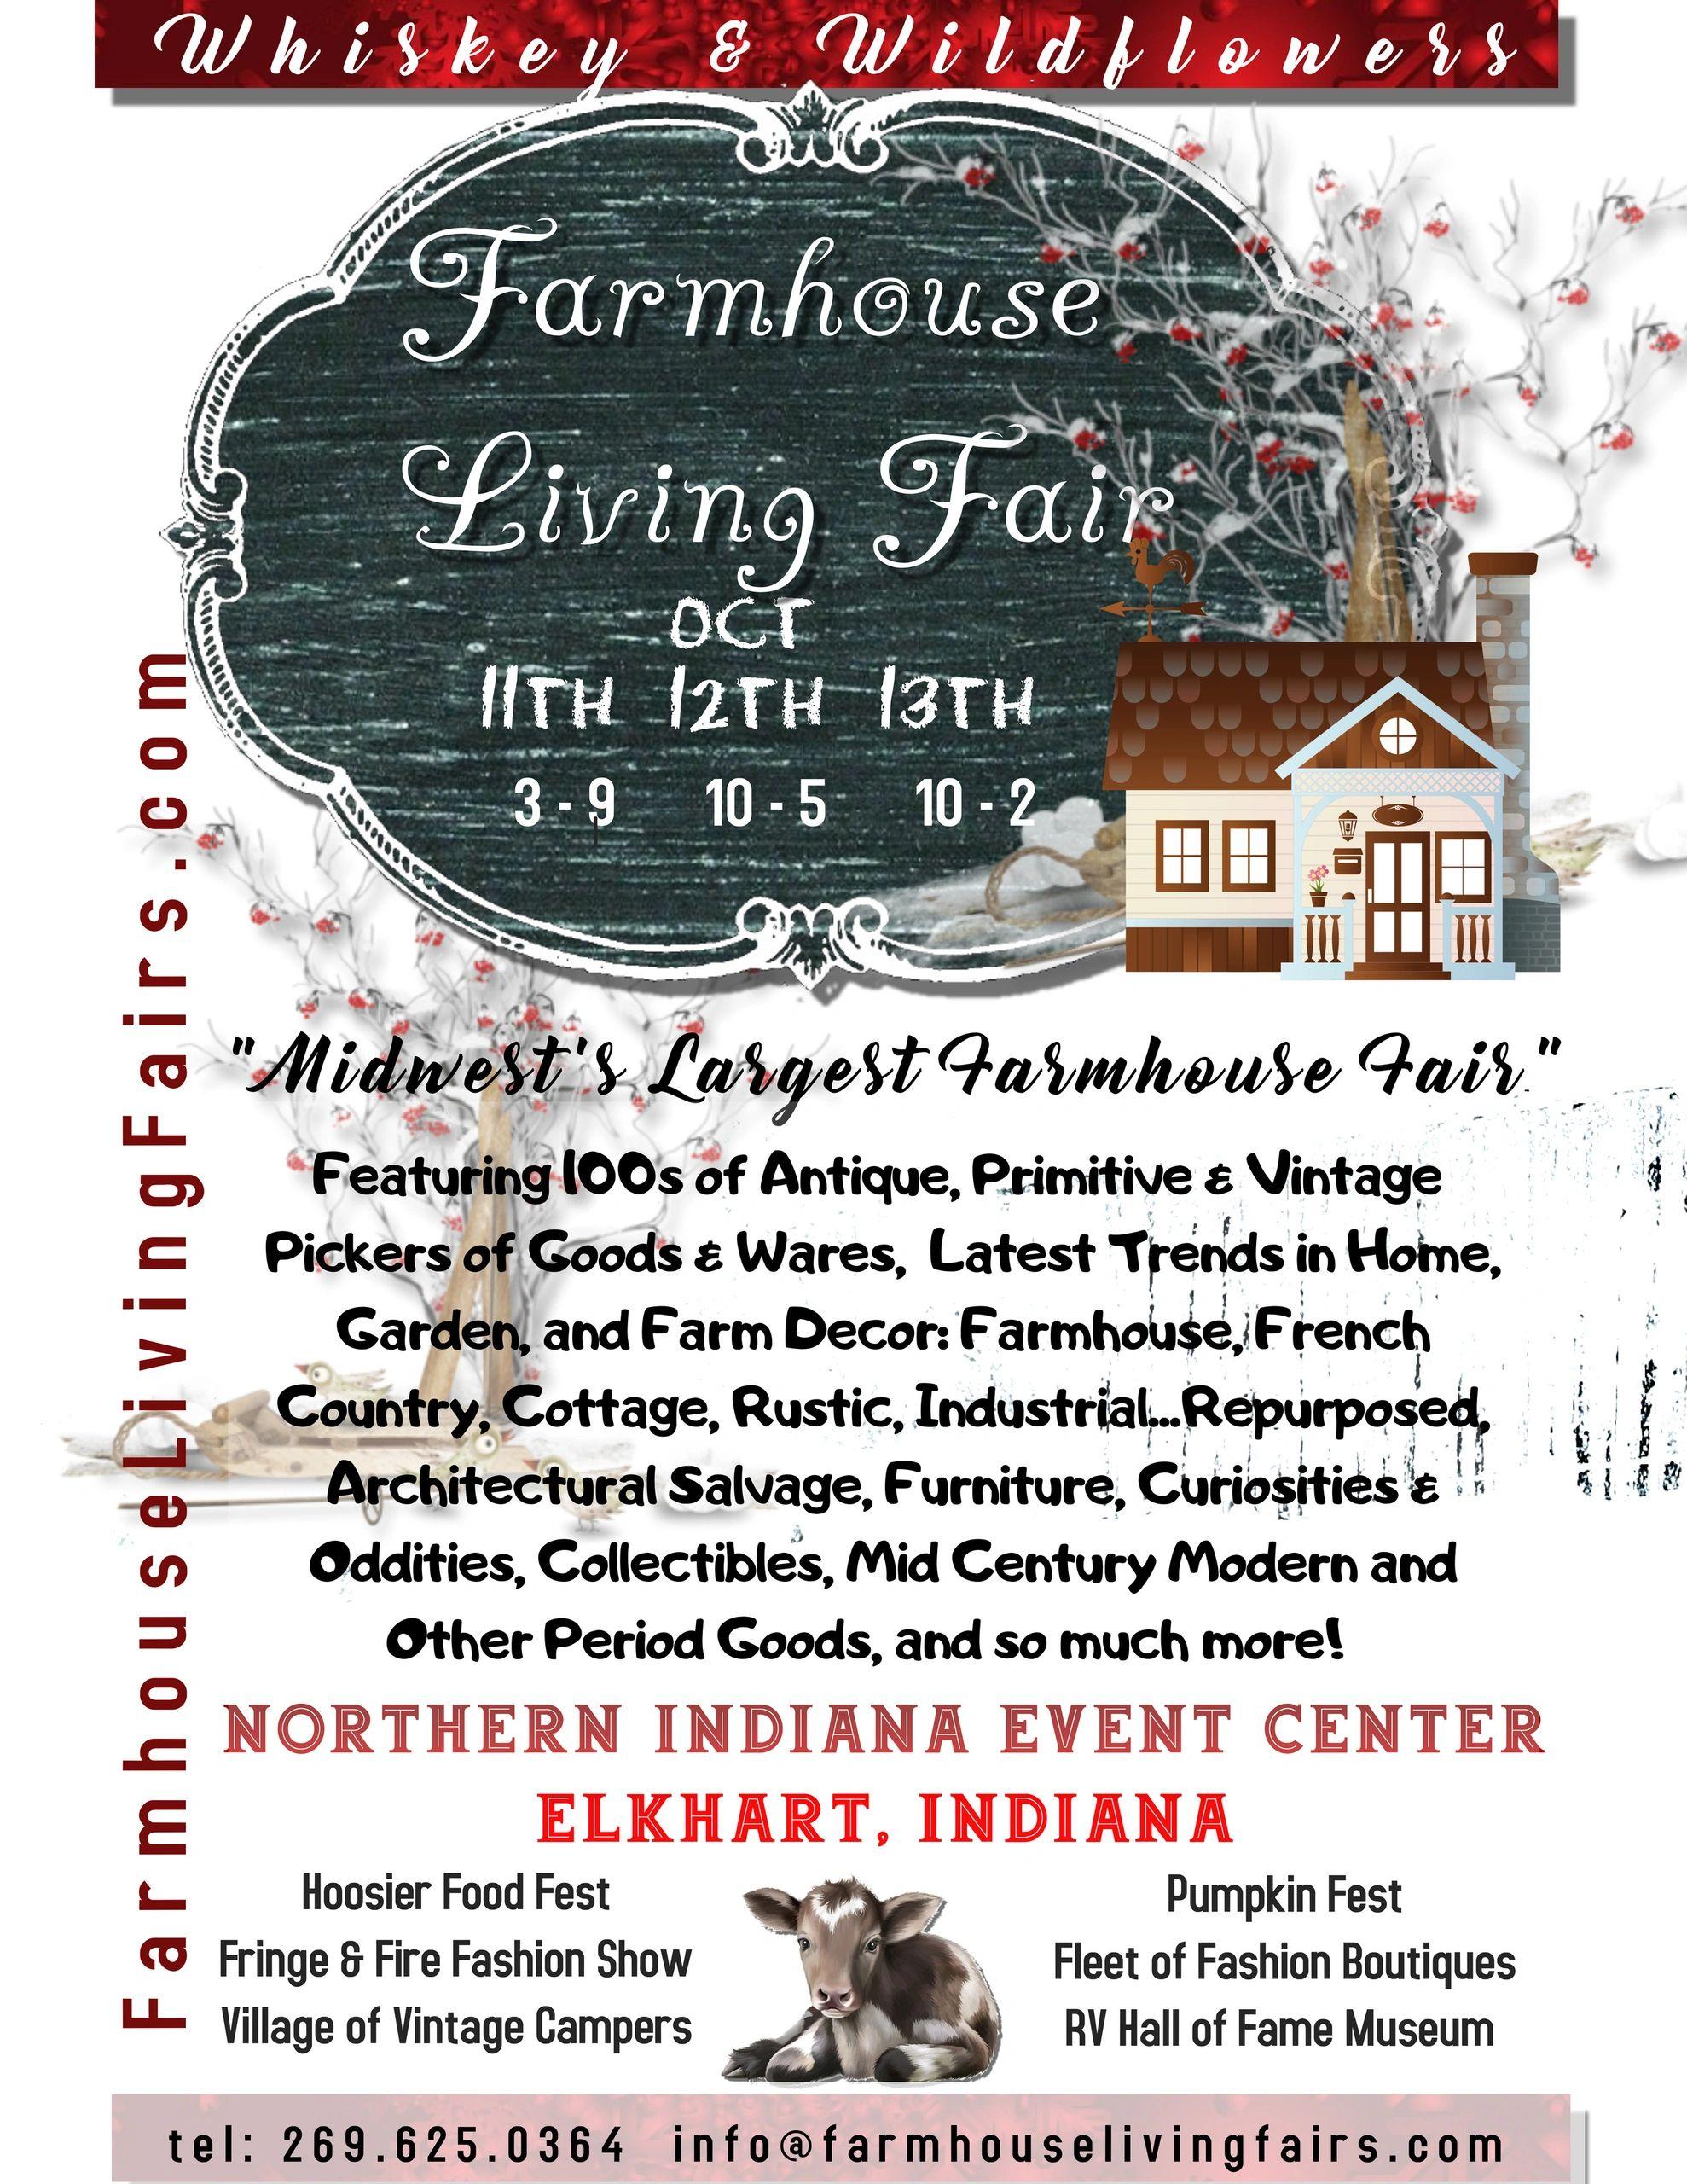 Country Living Fair 2020.Farmhouse Living Fair Coming To Elkhart Indiana Oct 11th 13th